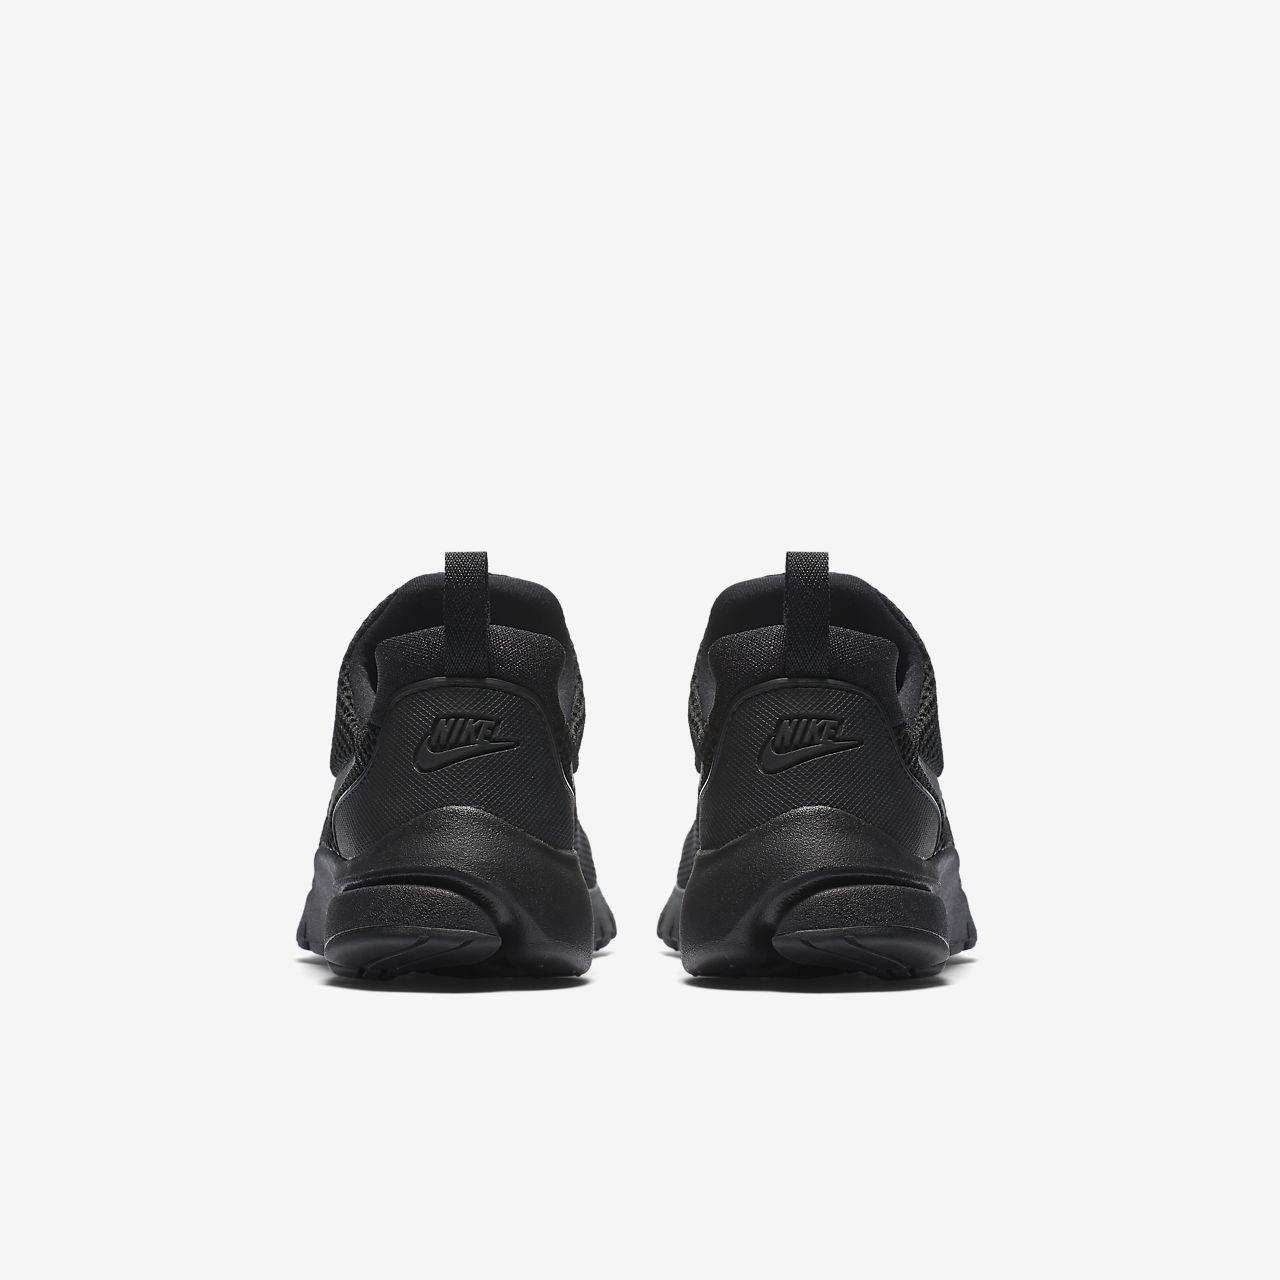 reputable site d1d50 821c9 ... Nike Presto Fly sko for store barn